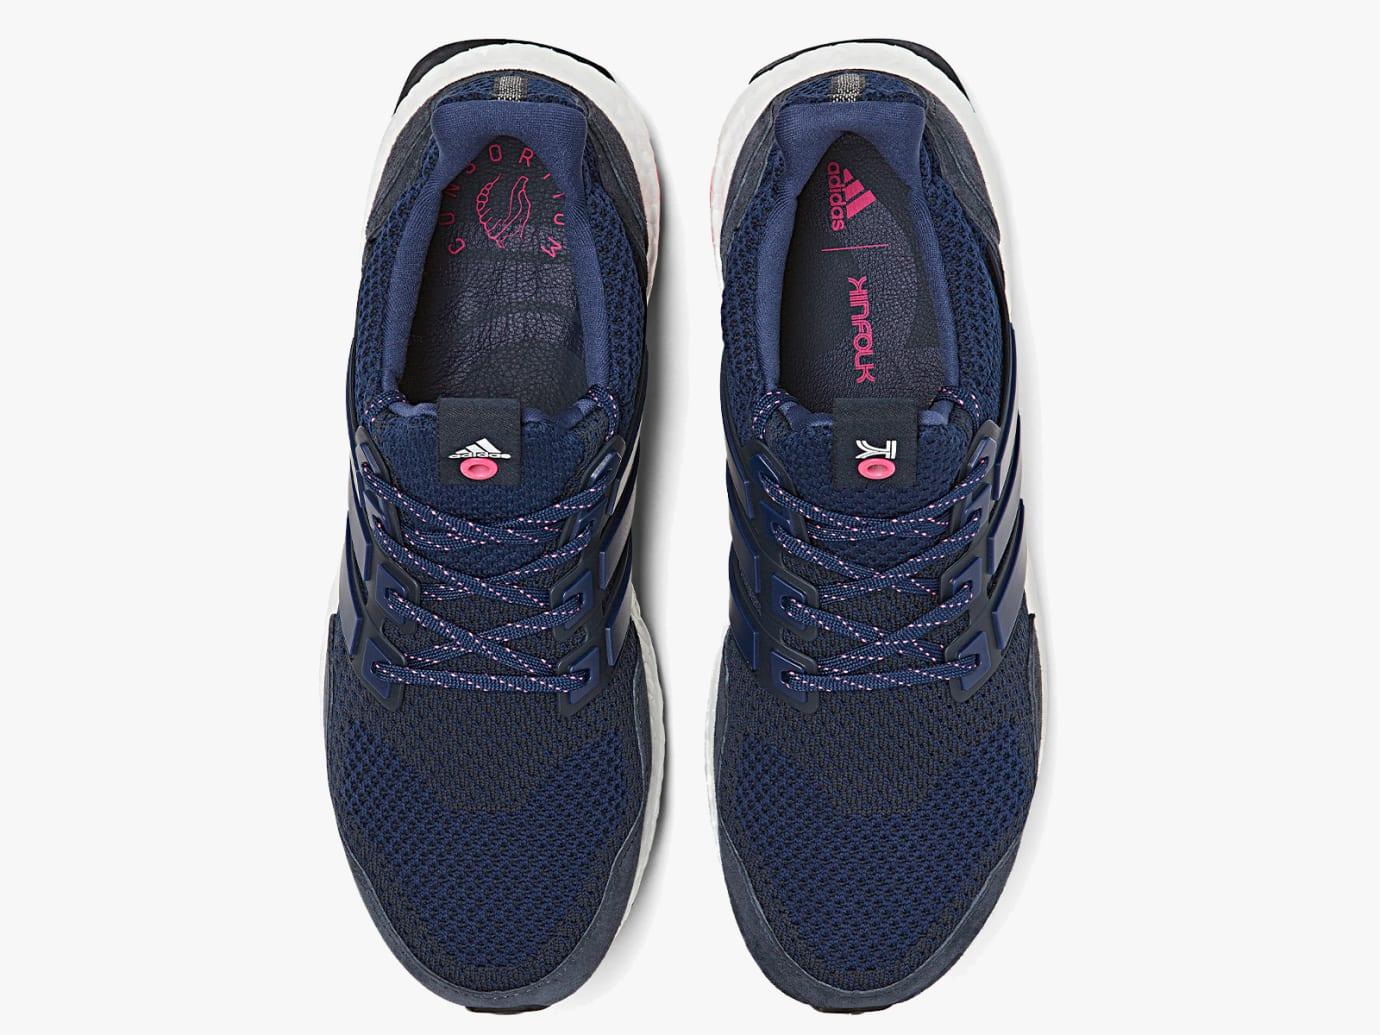 57d497922 Image via Sneakersnstuff Kinfolk x Adidas Consortium Ultra Boost BB9520  Release Date